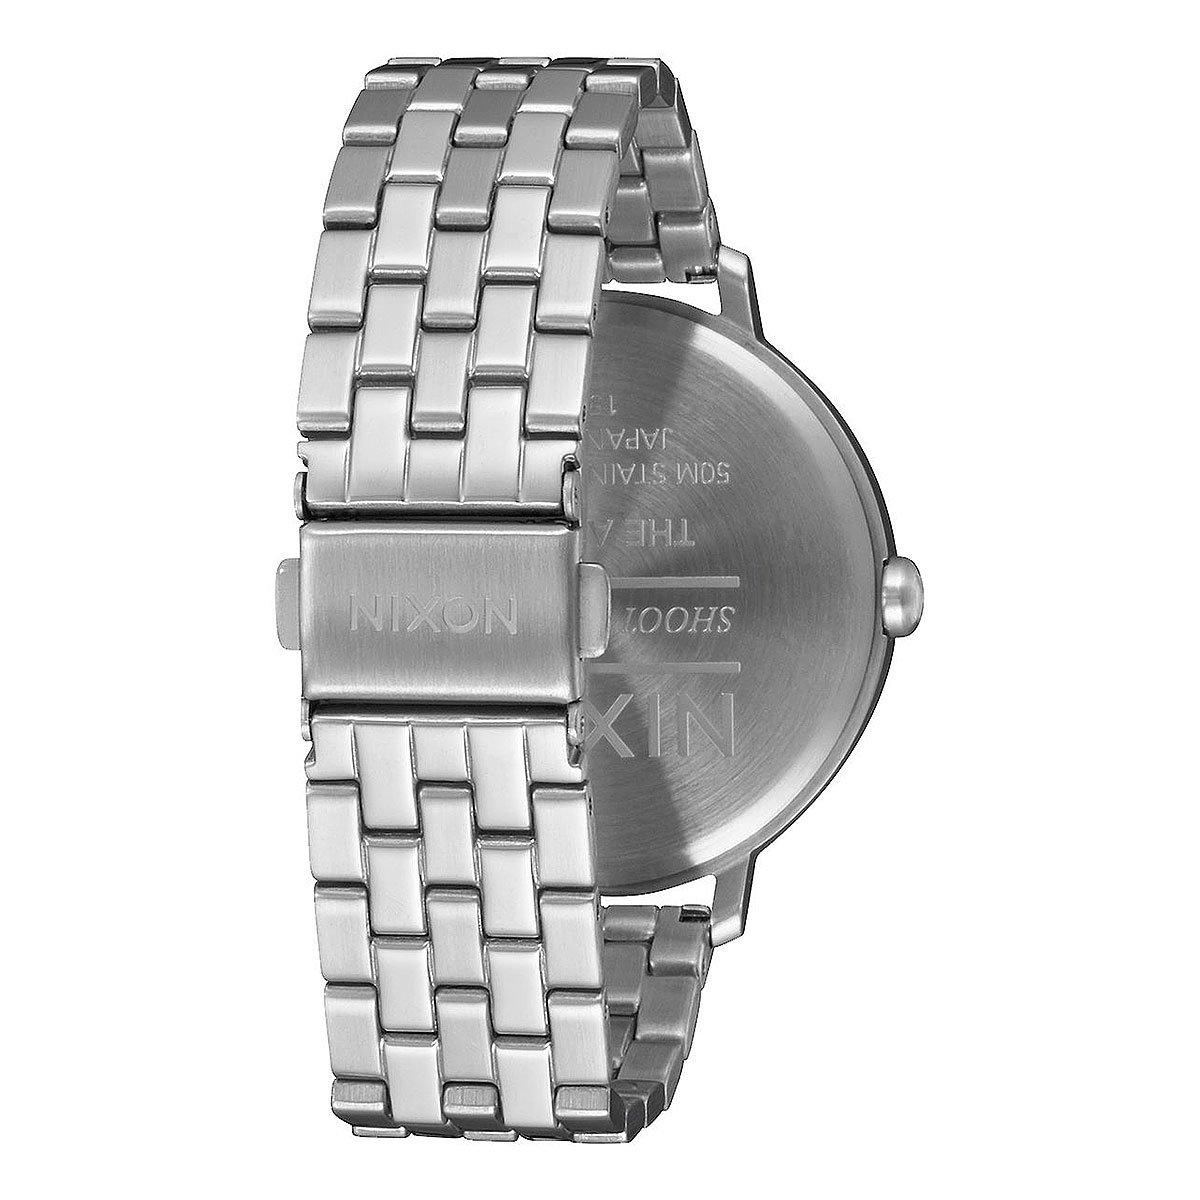 Кварцевые часы женские Nixon Arrow Silver